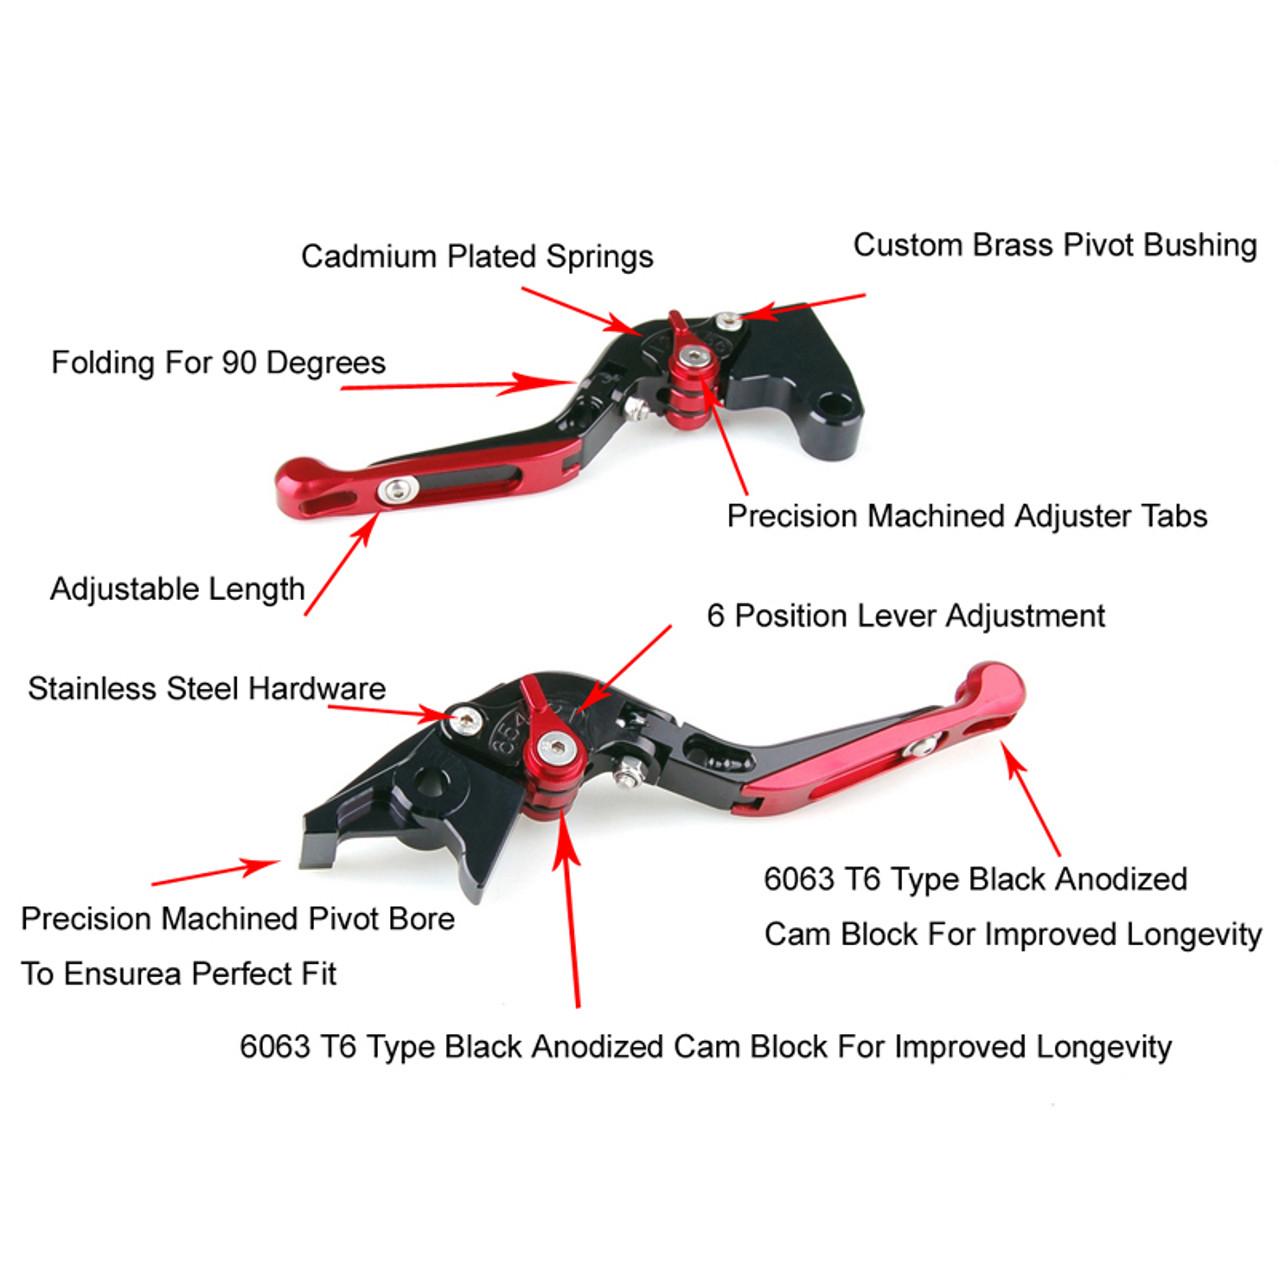 Staff Length Adjustable Brake Clutch Levers Ducati 748 750SS 1999-2002 (DB-80/DC-80)